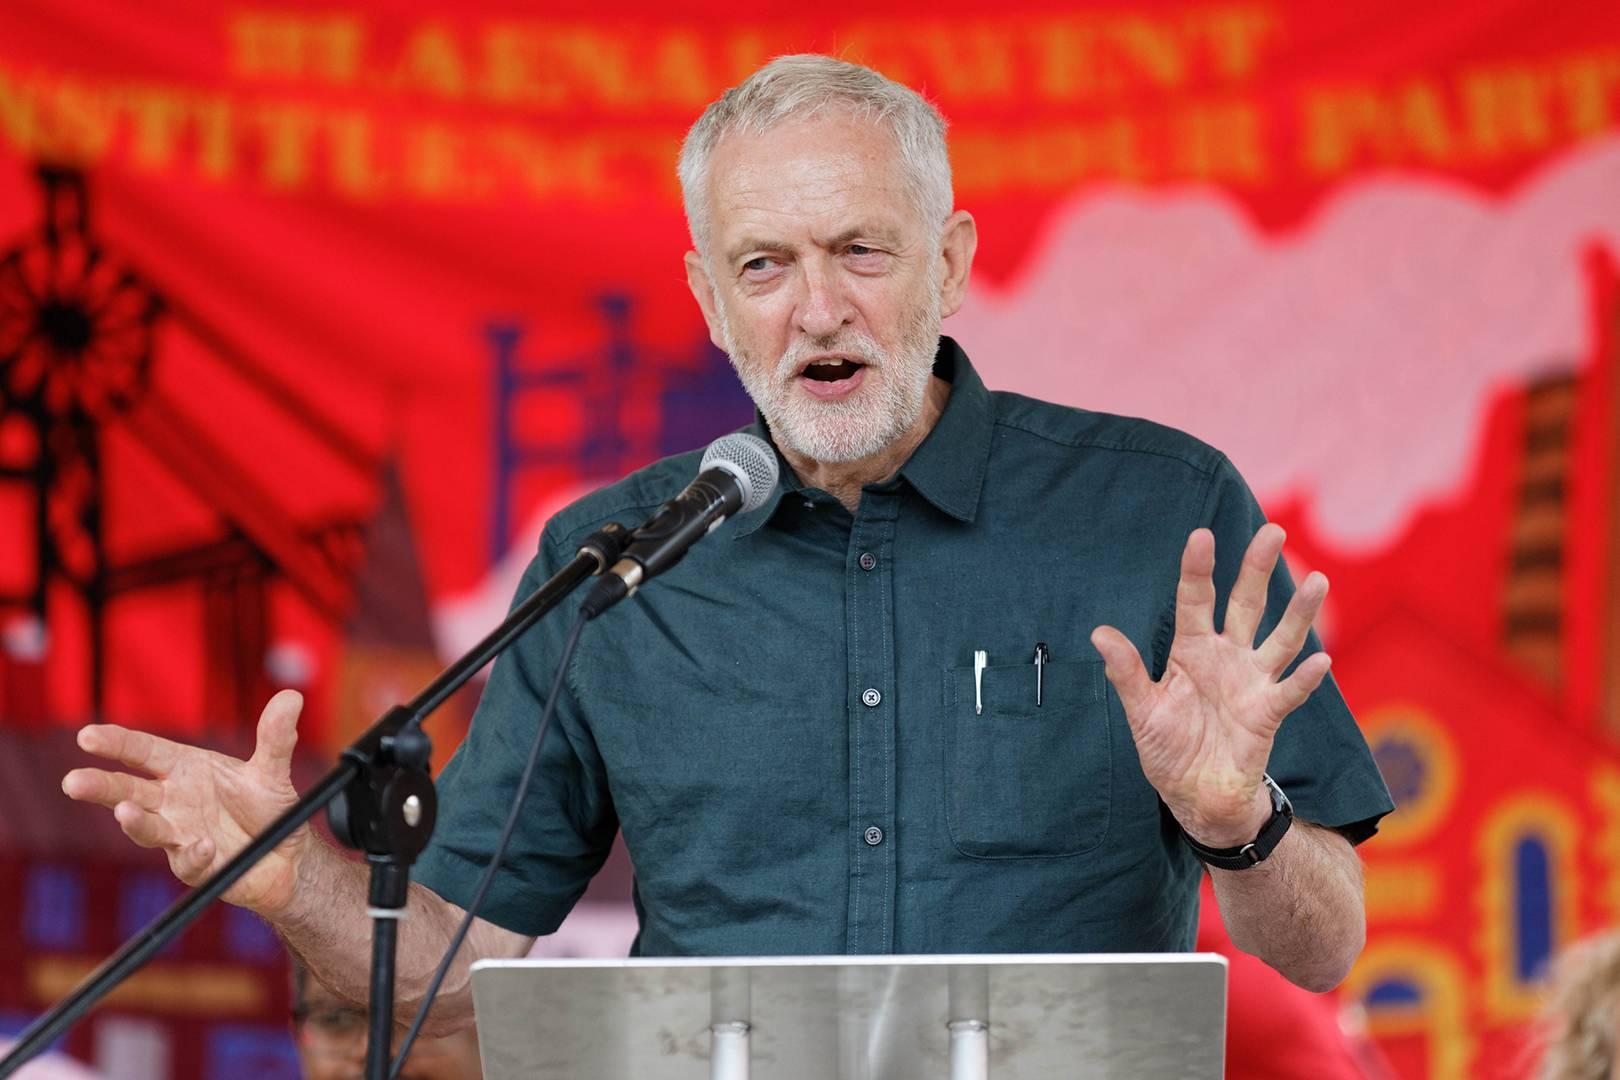 David Lammy MP interview: Alastair Campbell meets the backbench rebel |  British GQ